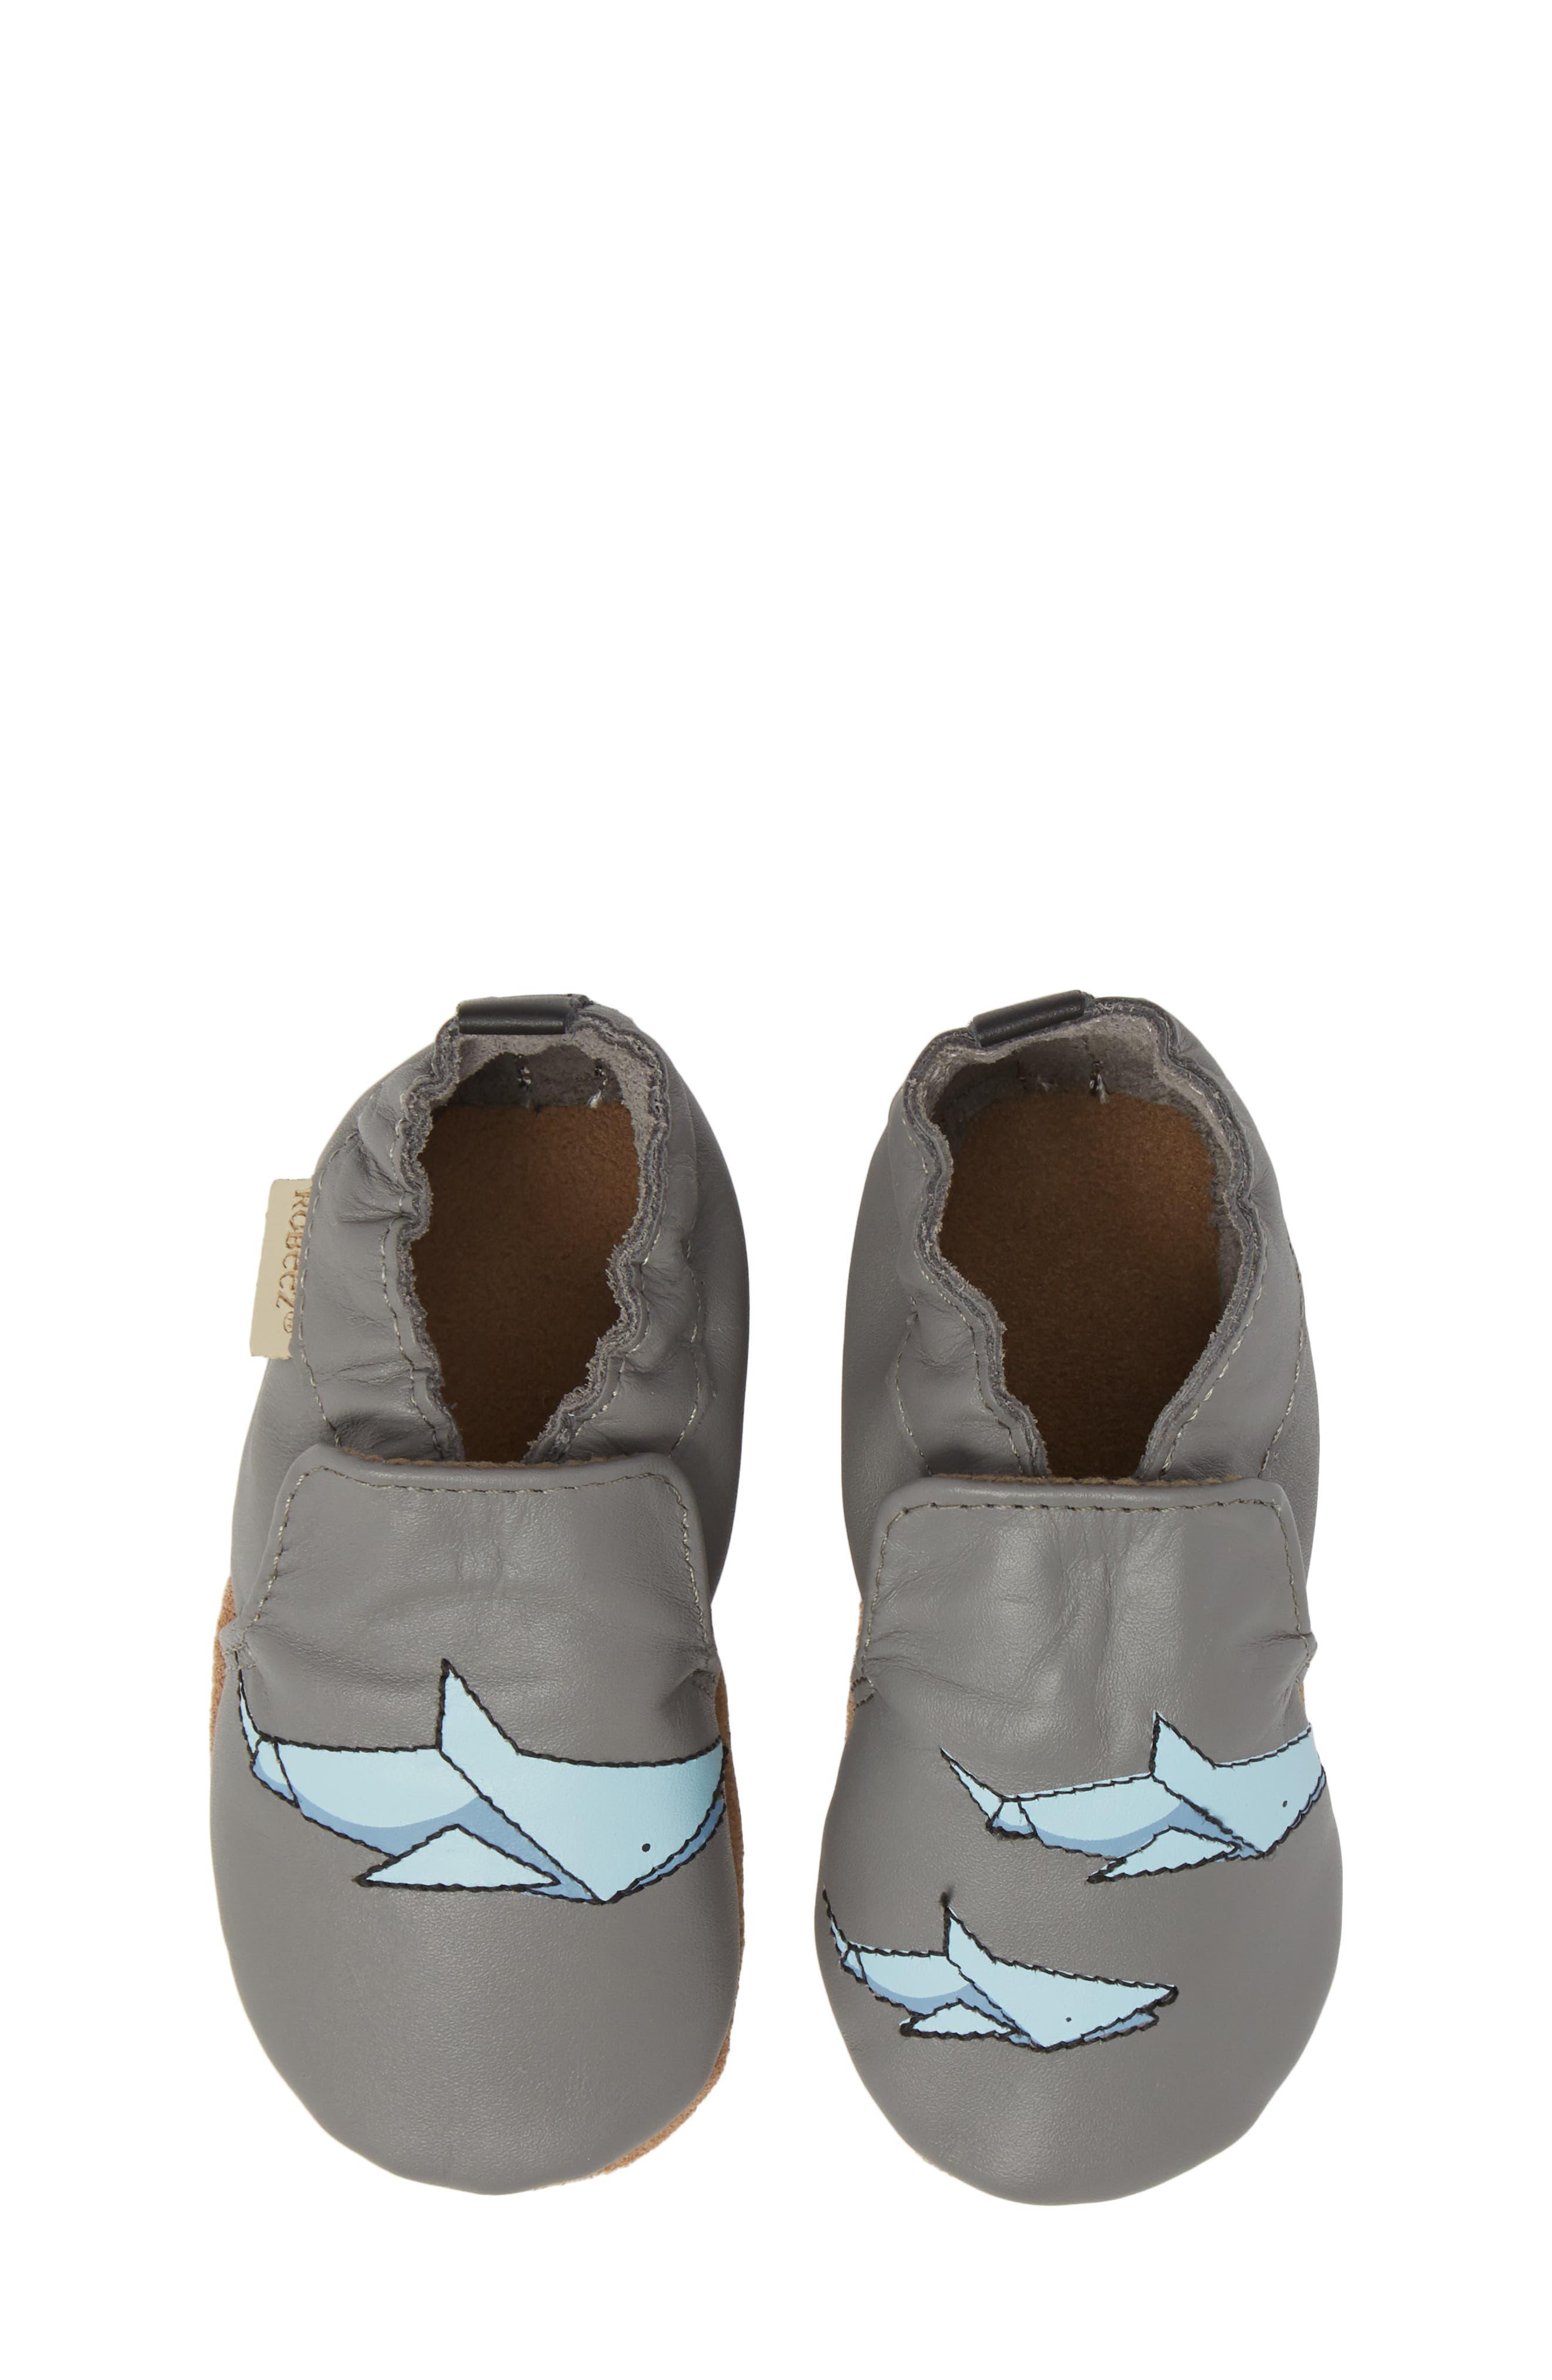 Sharktastic Moccasin Crib Shoe,                             Main thumbnail 1, color,                             Grey